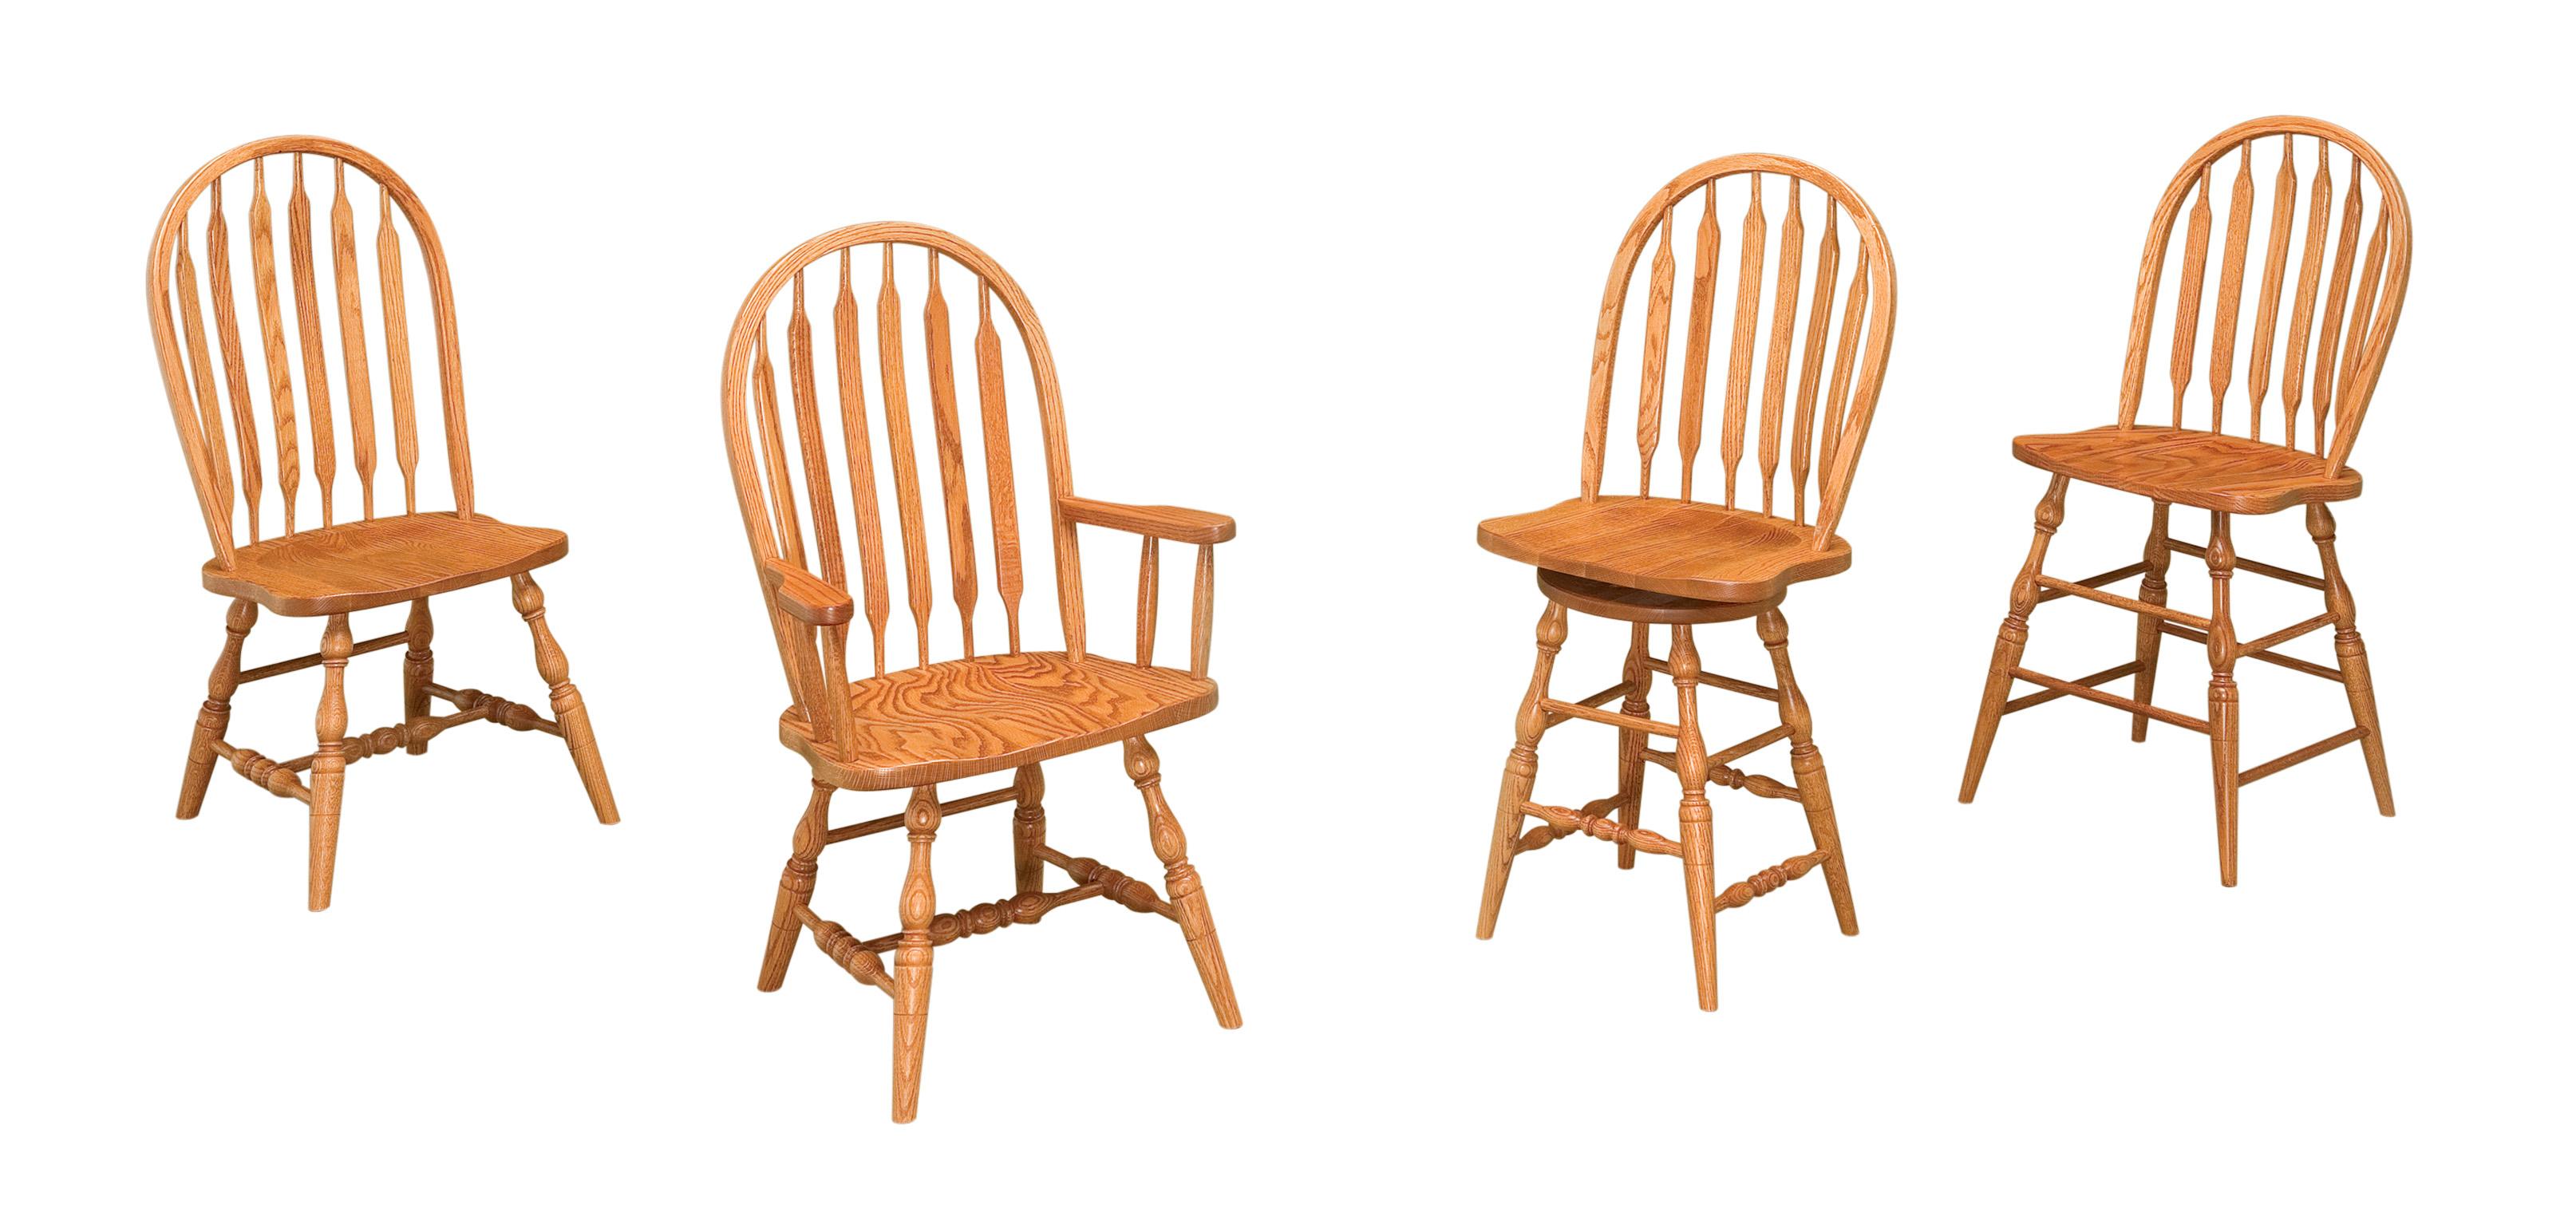 Amish Bowback Chairs